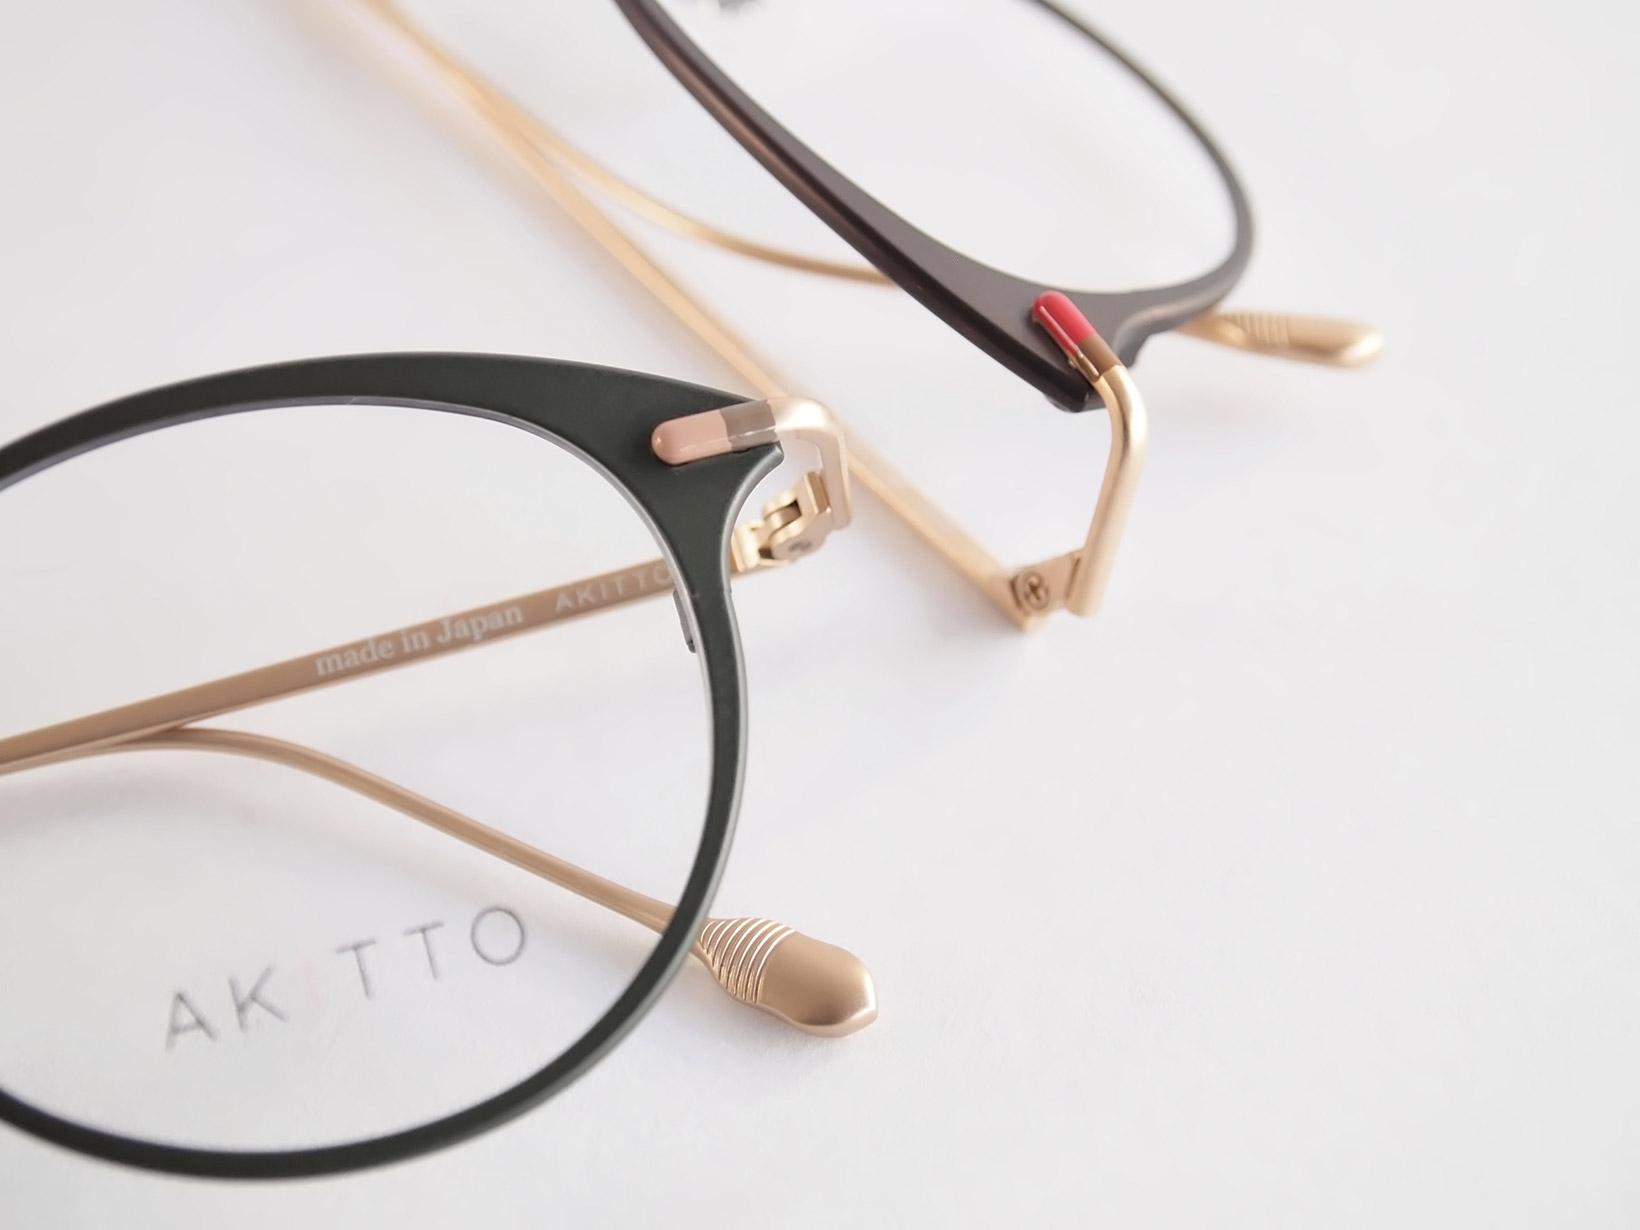 AKITTO 2019-1st aco size:46□19 material:titanium price:¥42,000-(+tax)